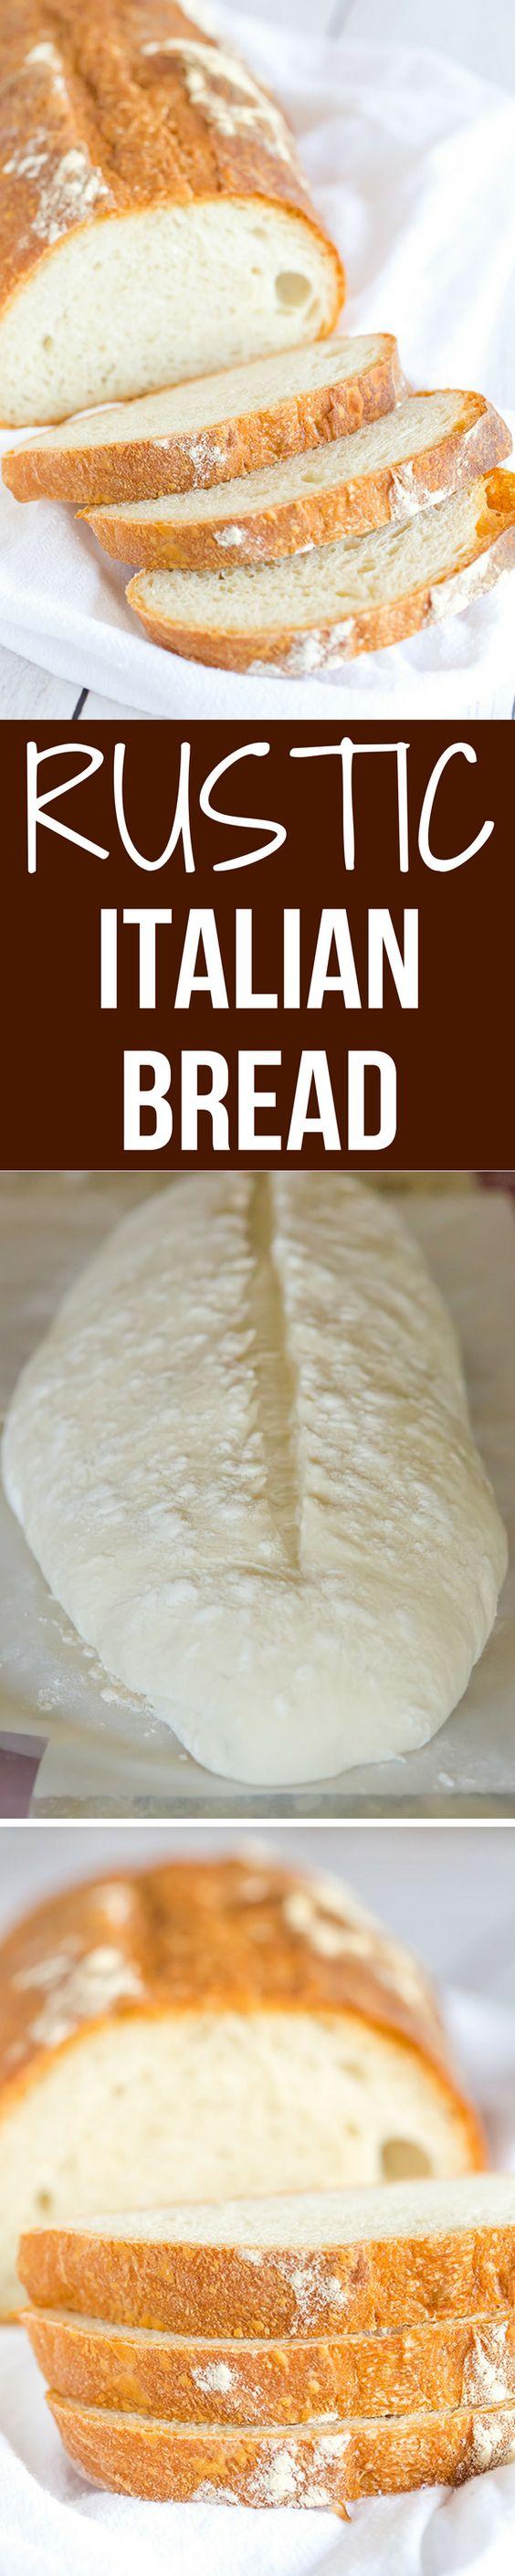 flirting meme with bread machine recipe using